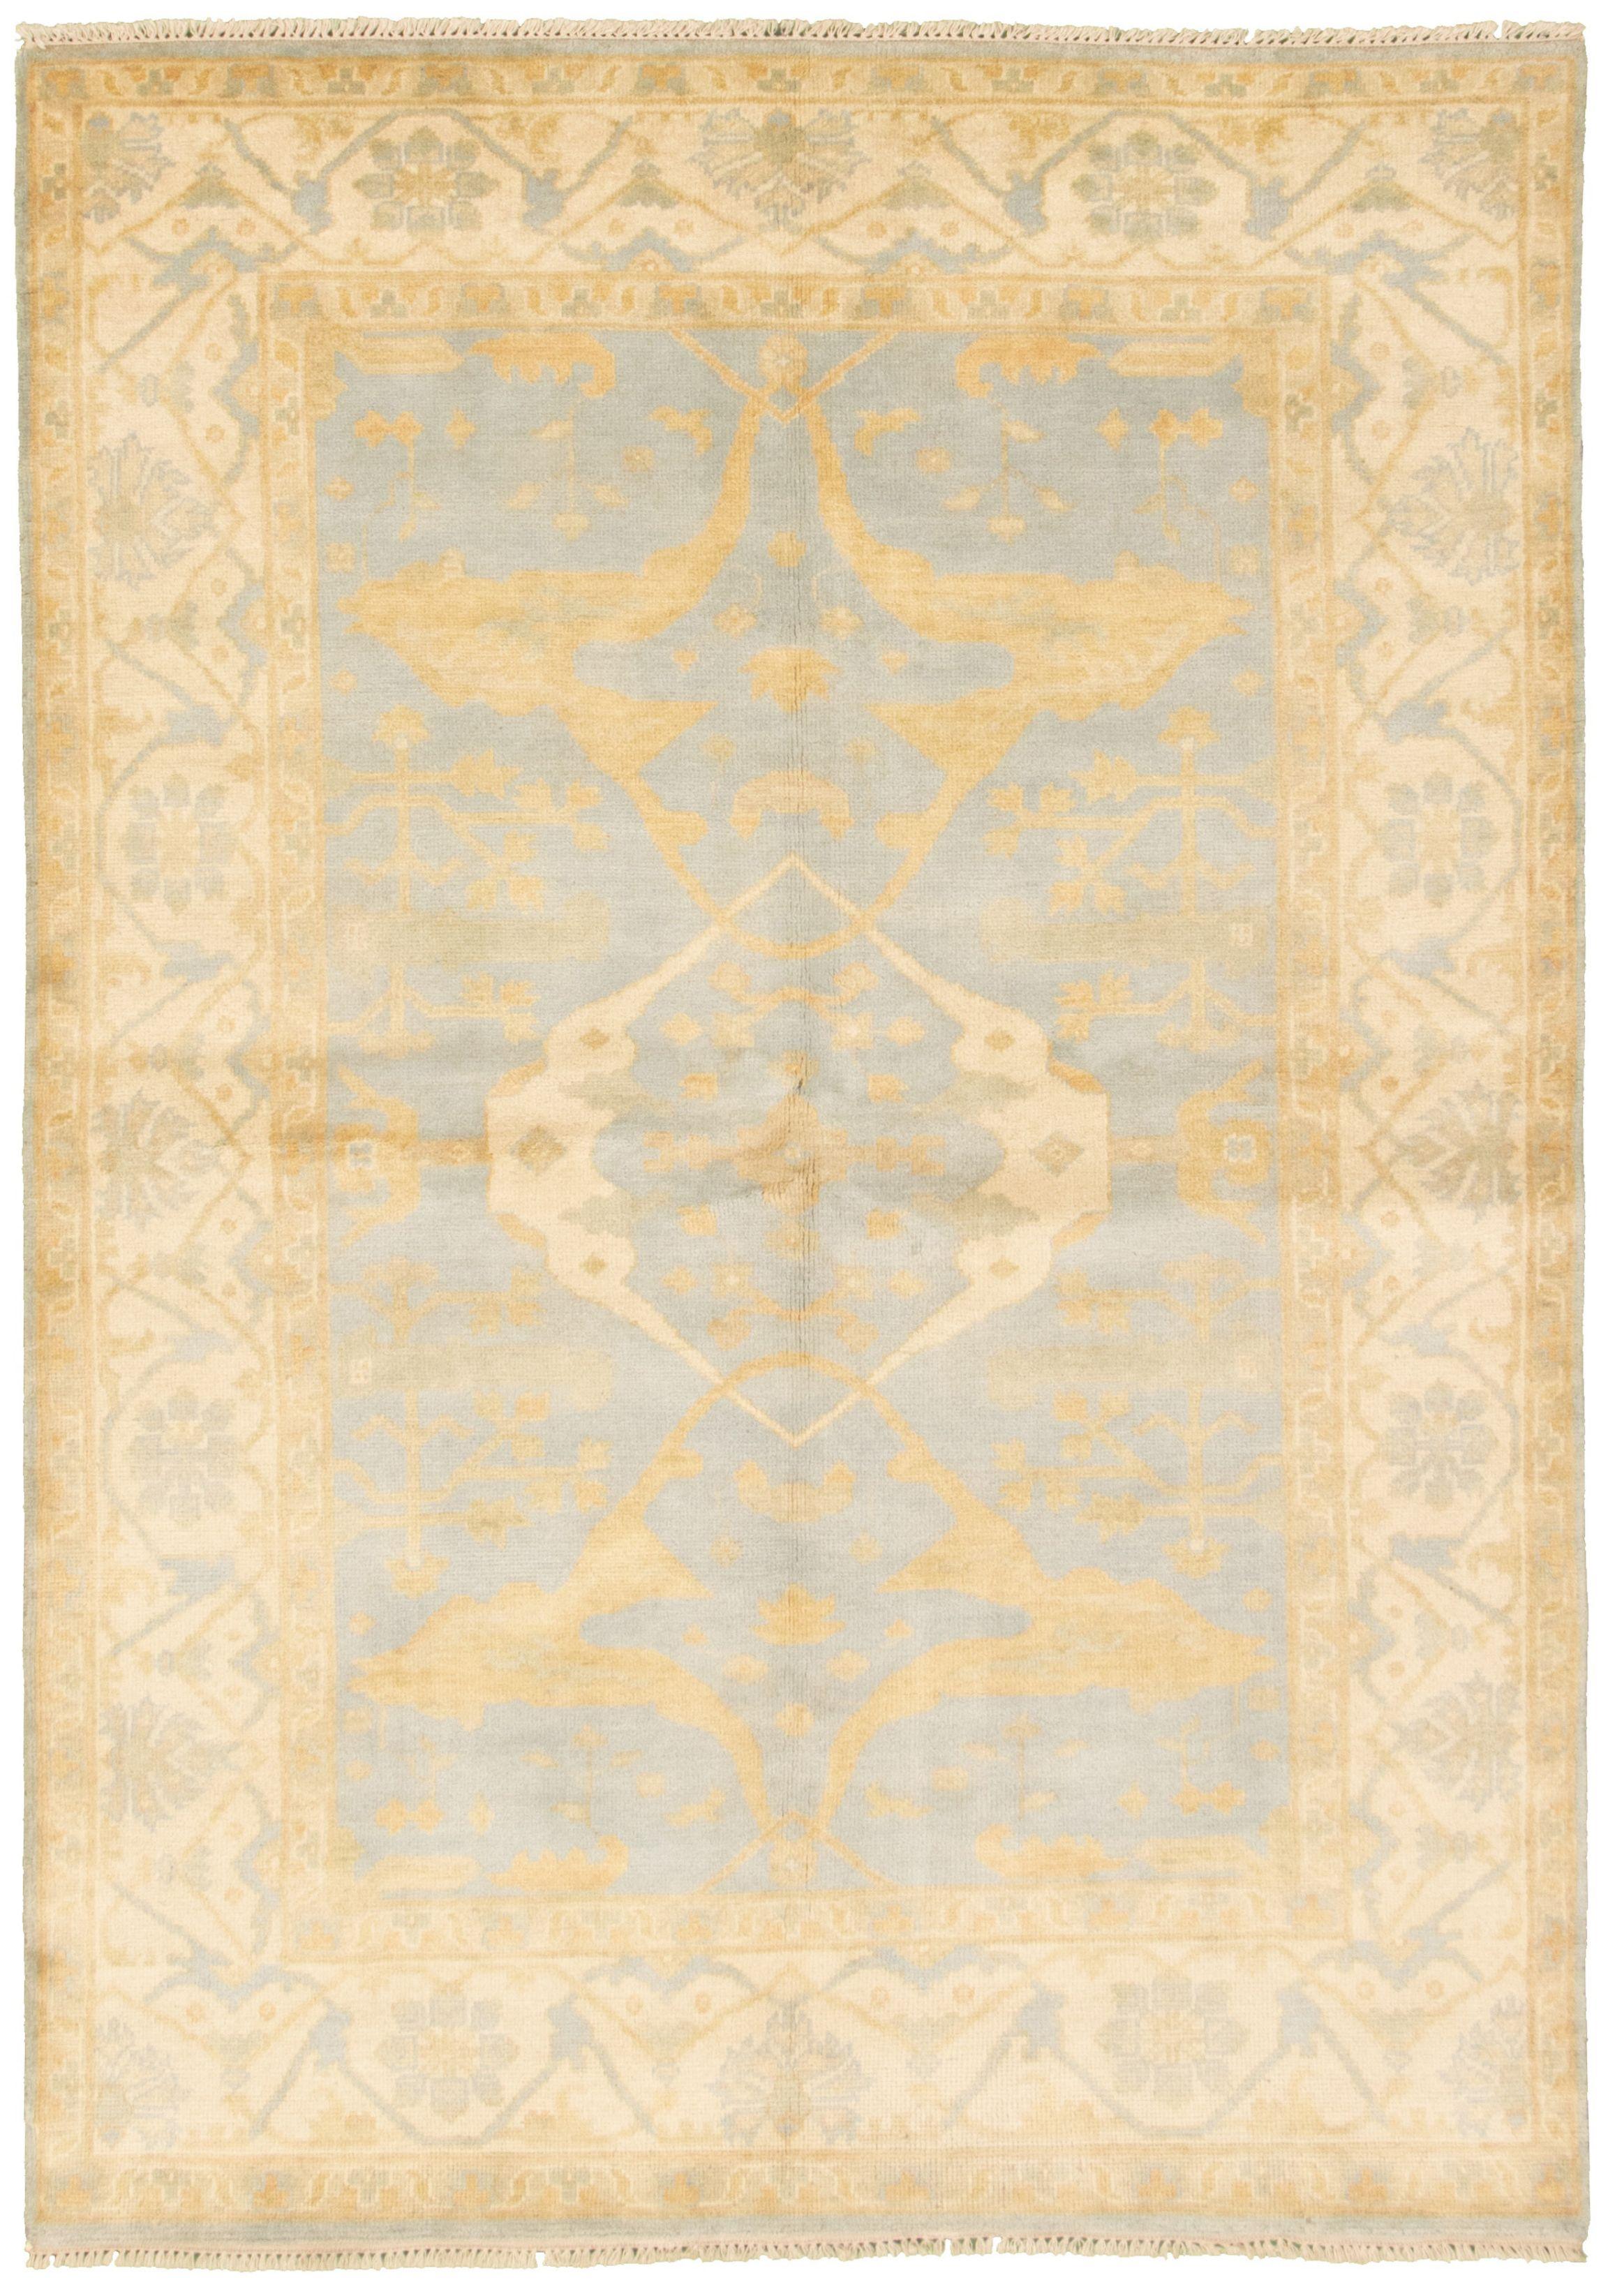 "Hand-knotted Royal Ushak Light Blue  Wool Rug 6'2"" x 8'10""  Size: 6'2"" x 8'10"""